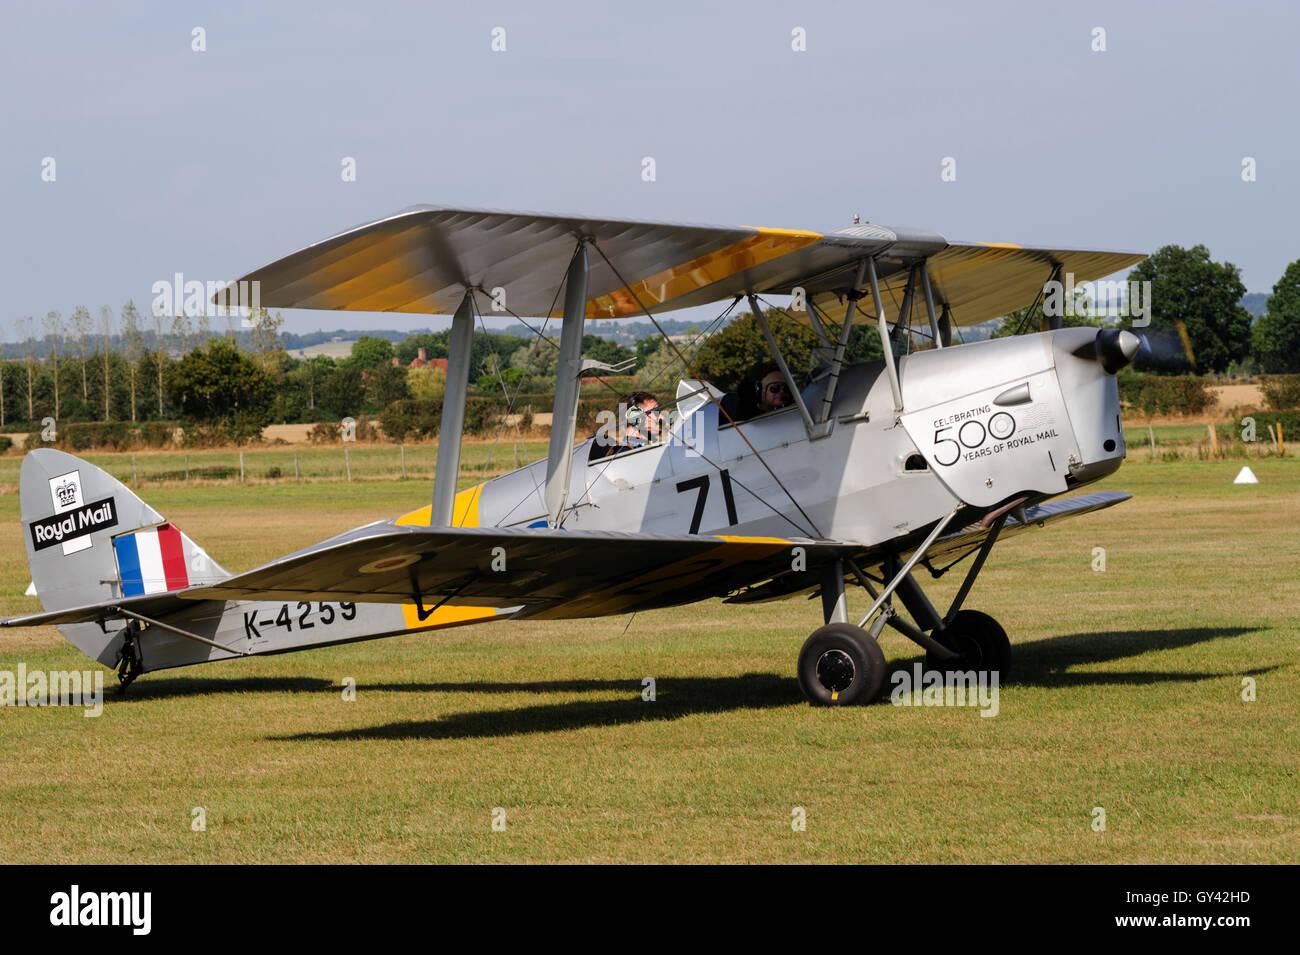 Vintage Tiger Aircrafts